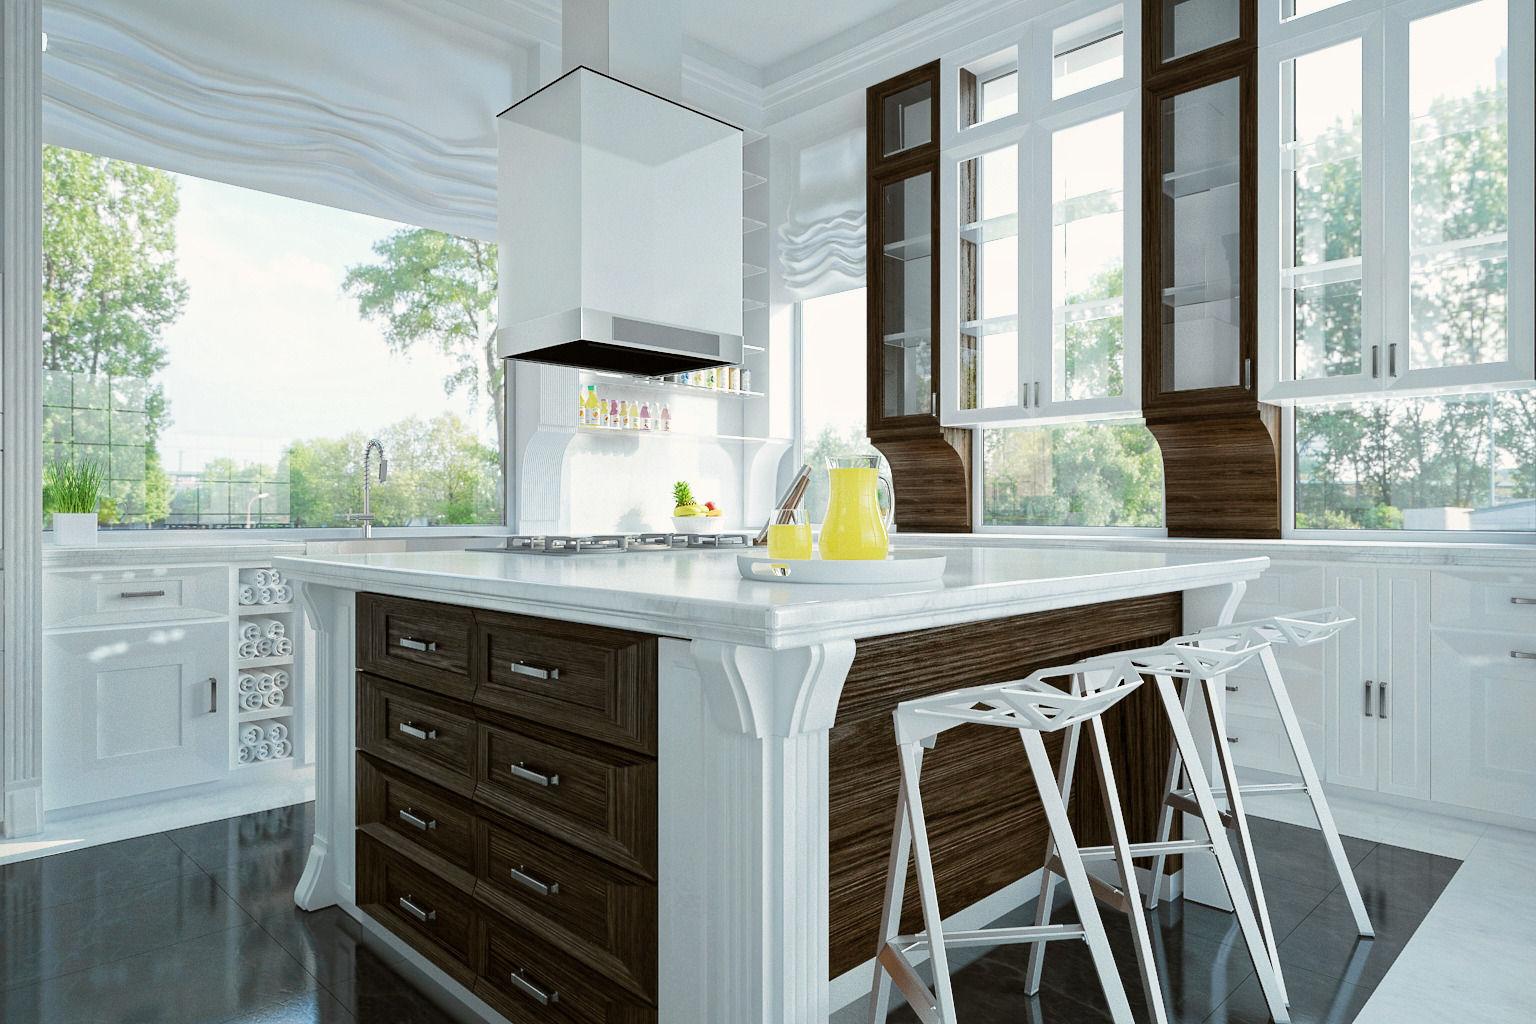 Royal Kitchen Design Interior 3d Model Max 2